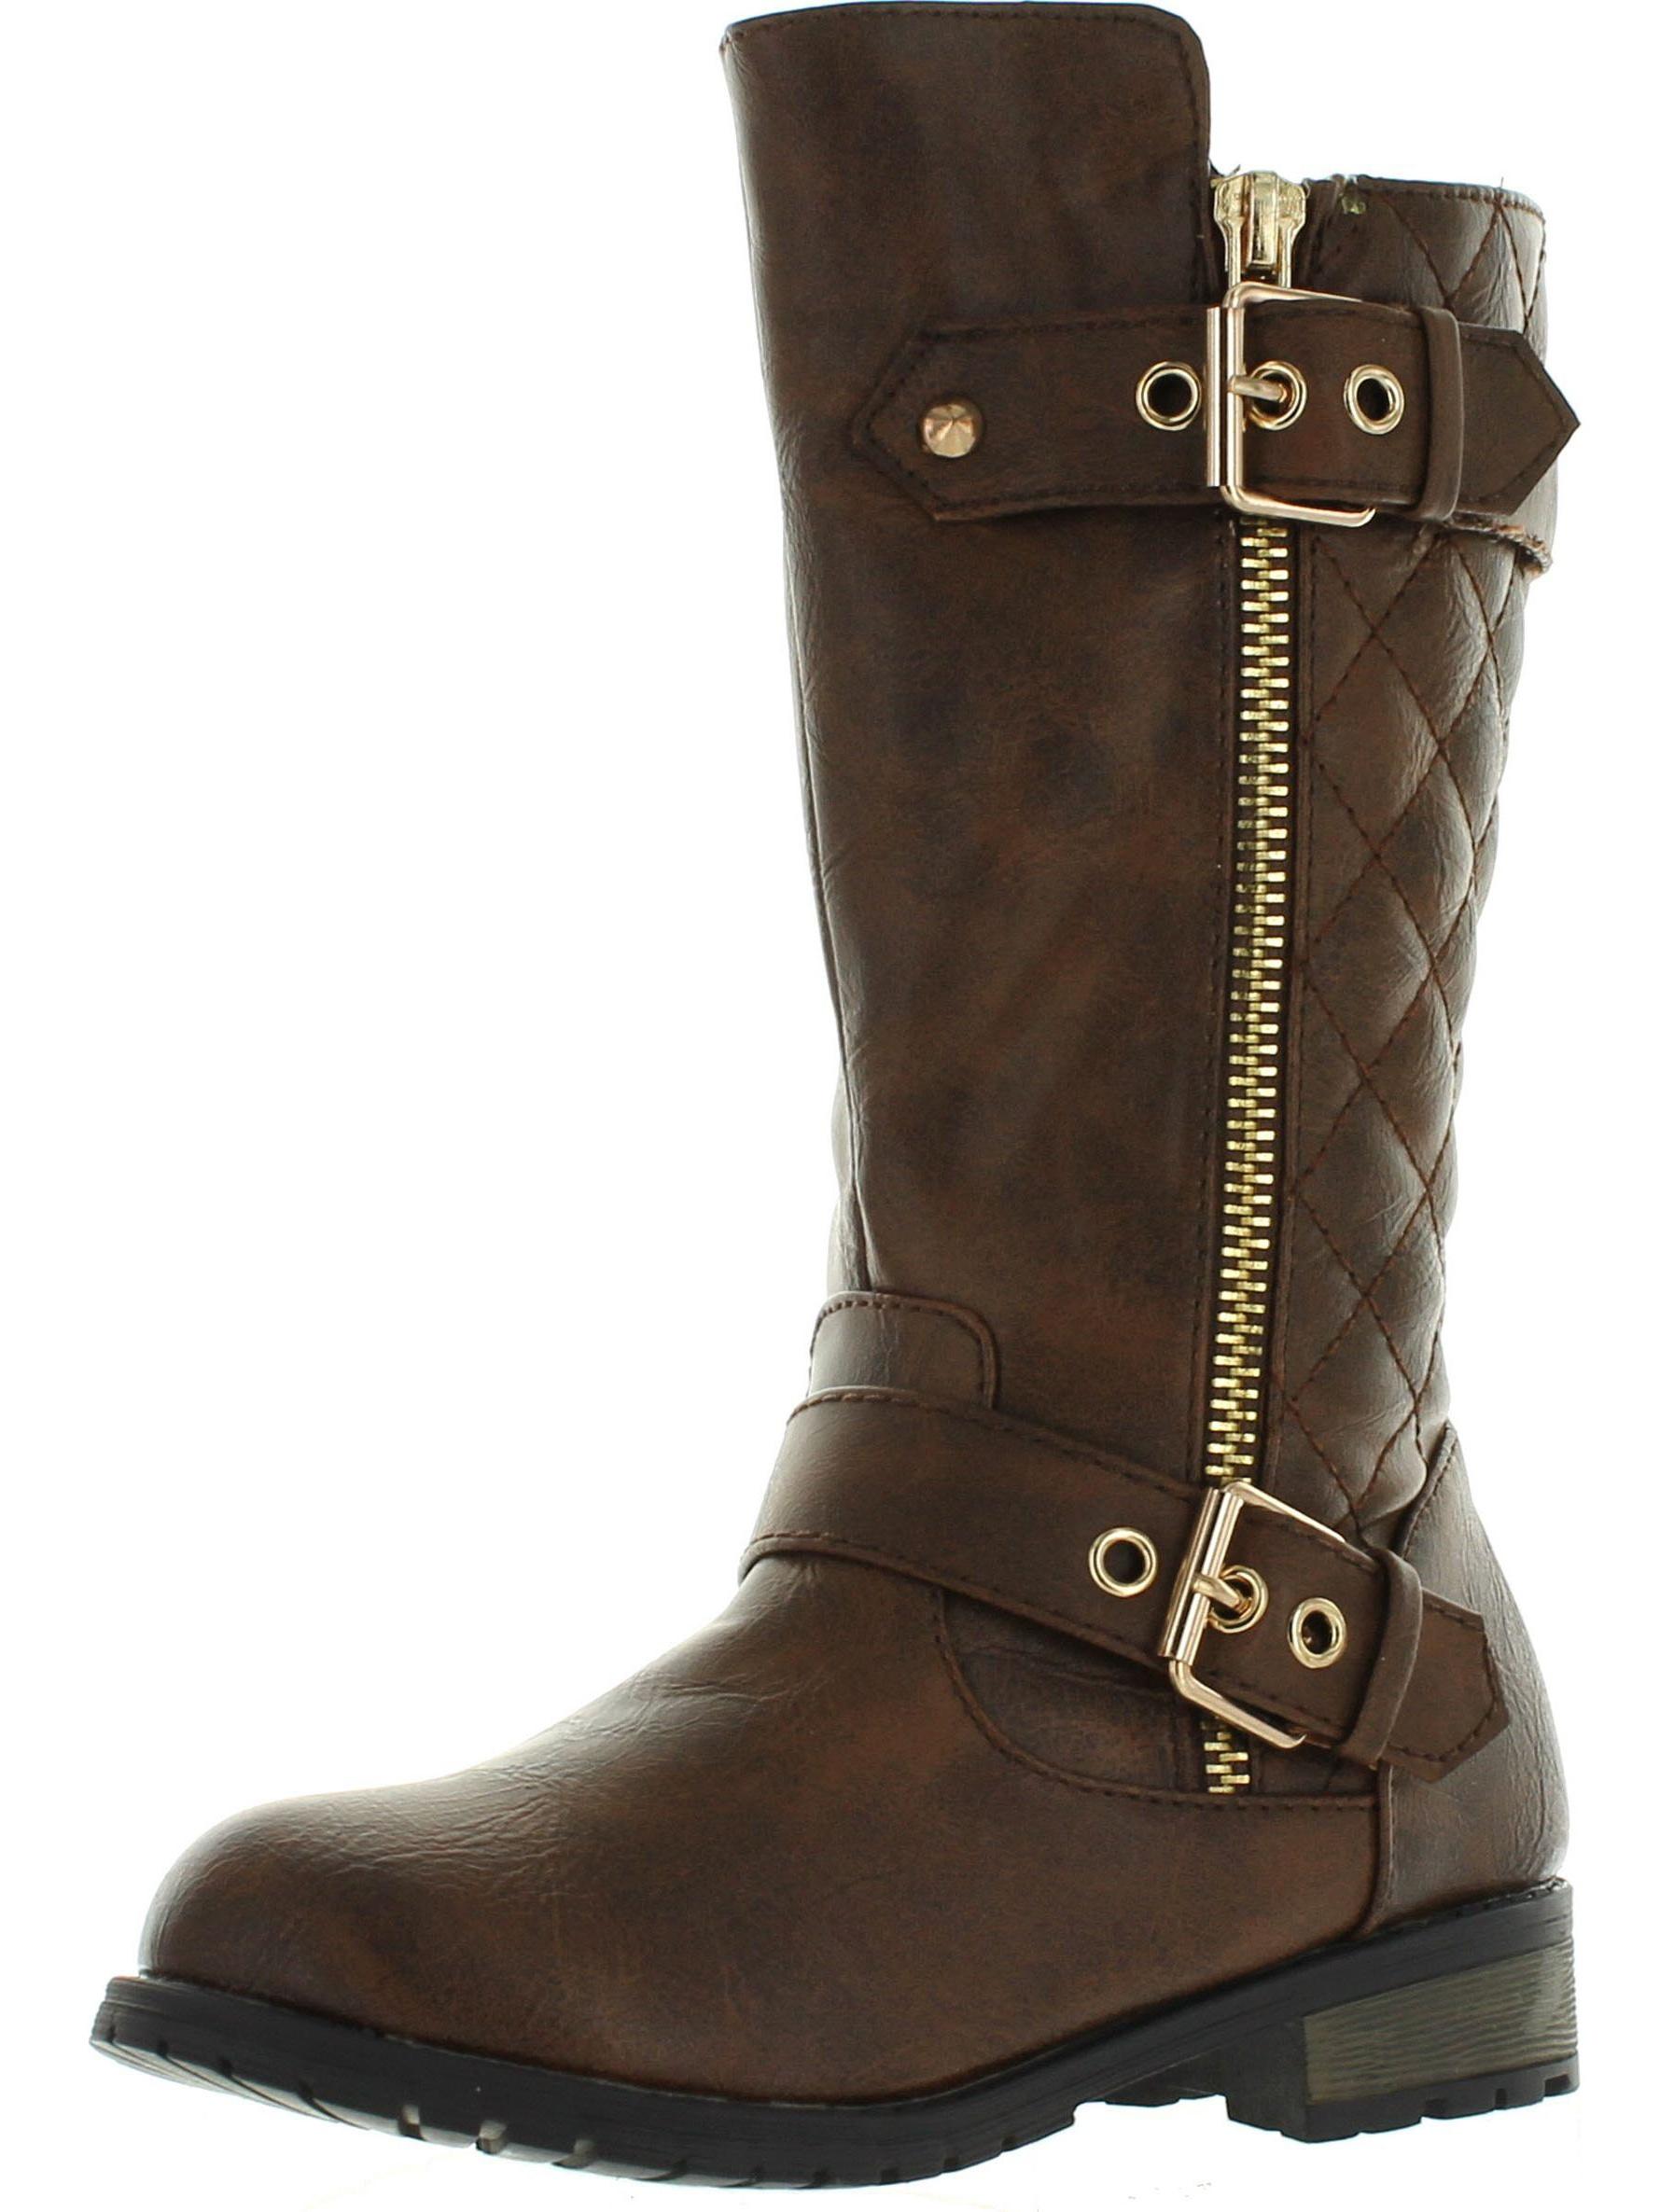 Girls Boots & Booties - Walmart.com